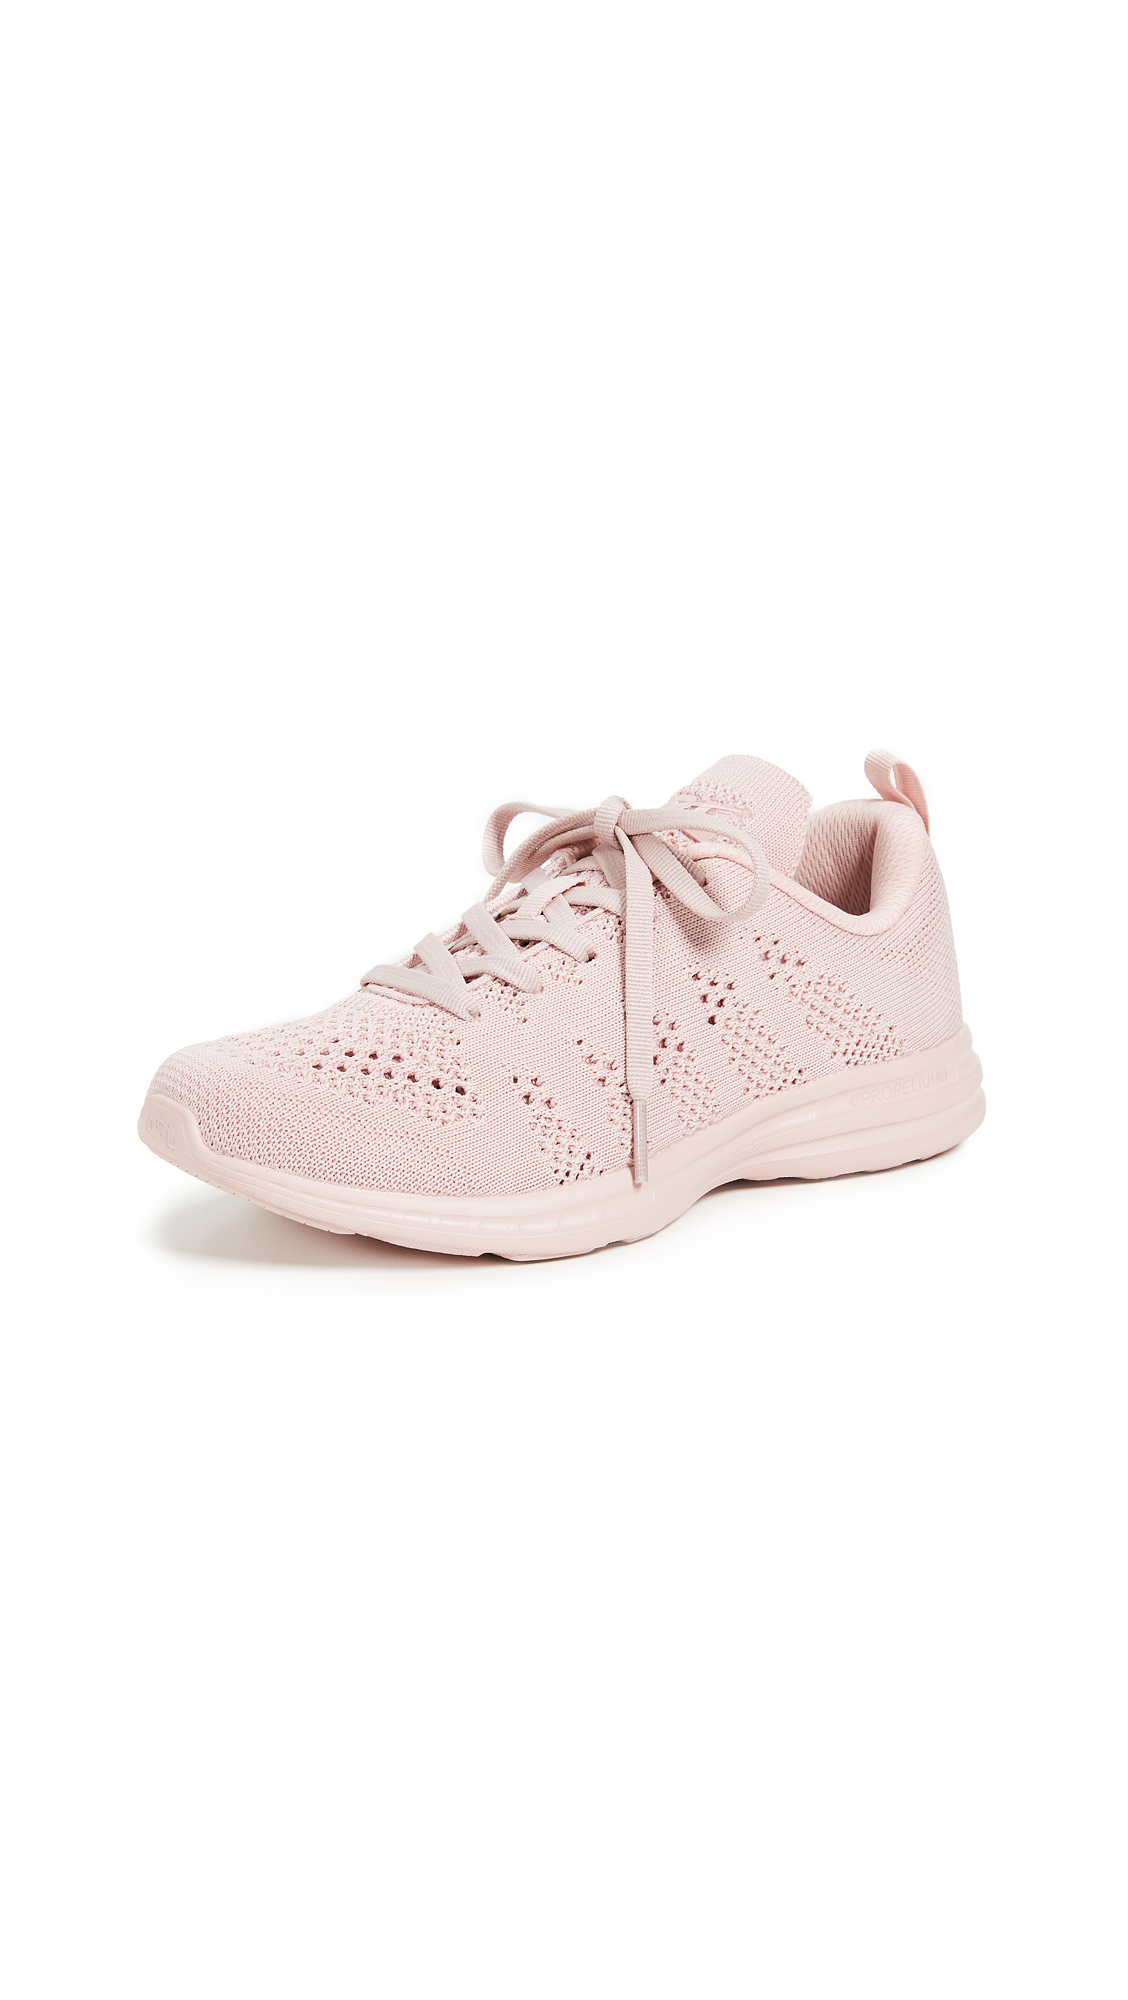 APL ATHLETIC PROPULSION LABS Techloom Pro Mesh Sneakers in Pastel Pink